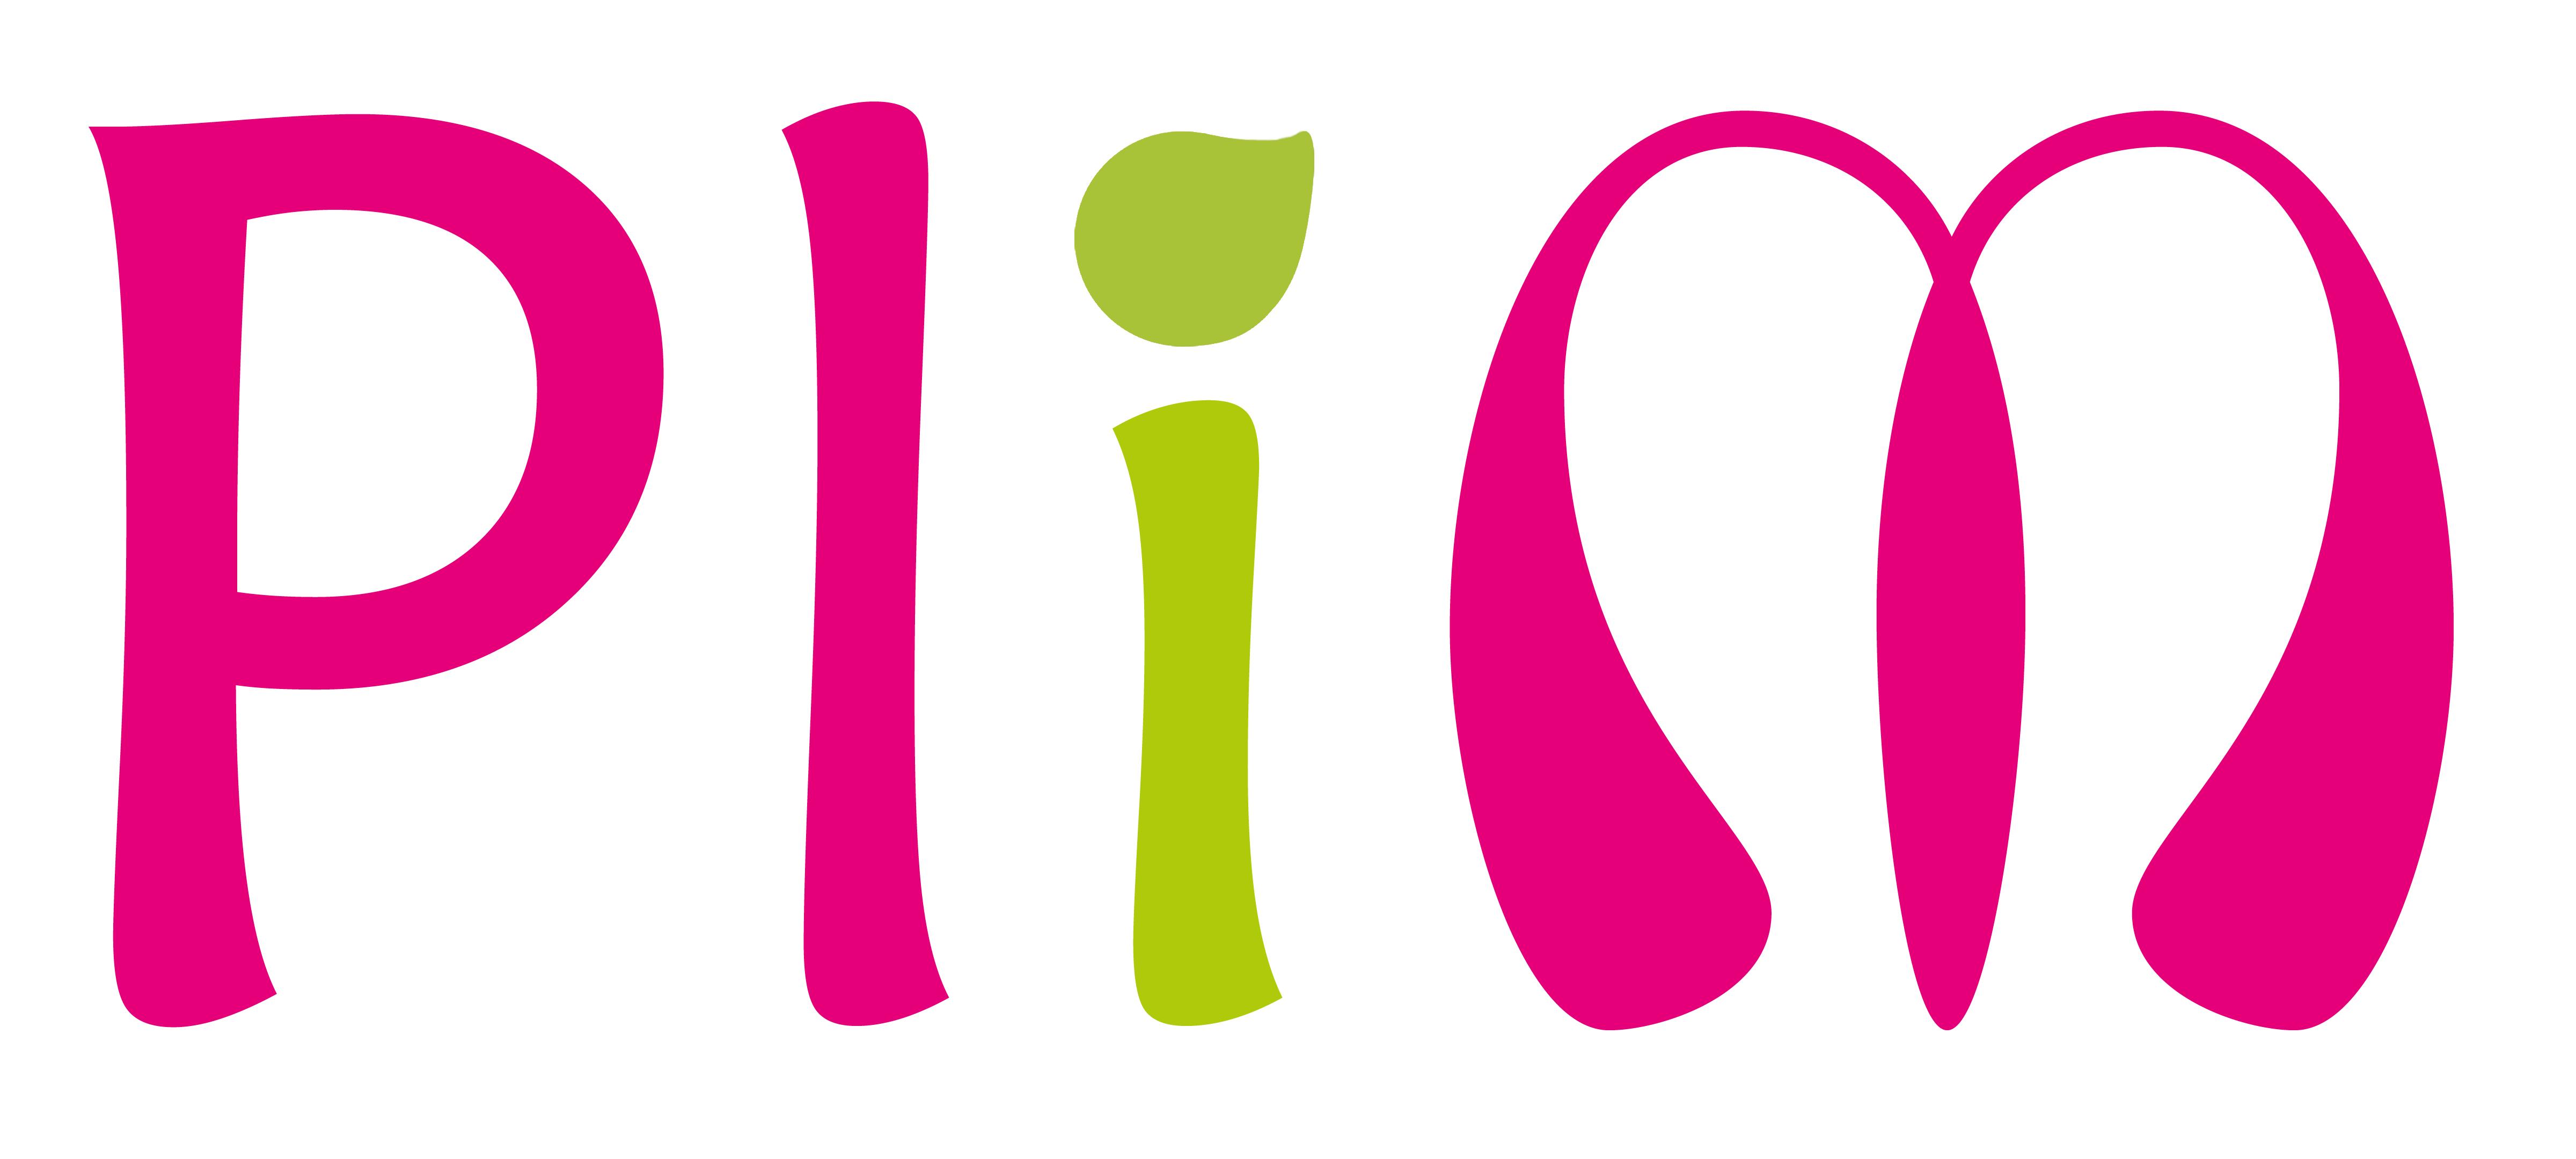 Logo 2015 printable